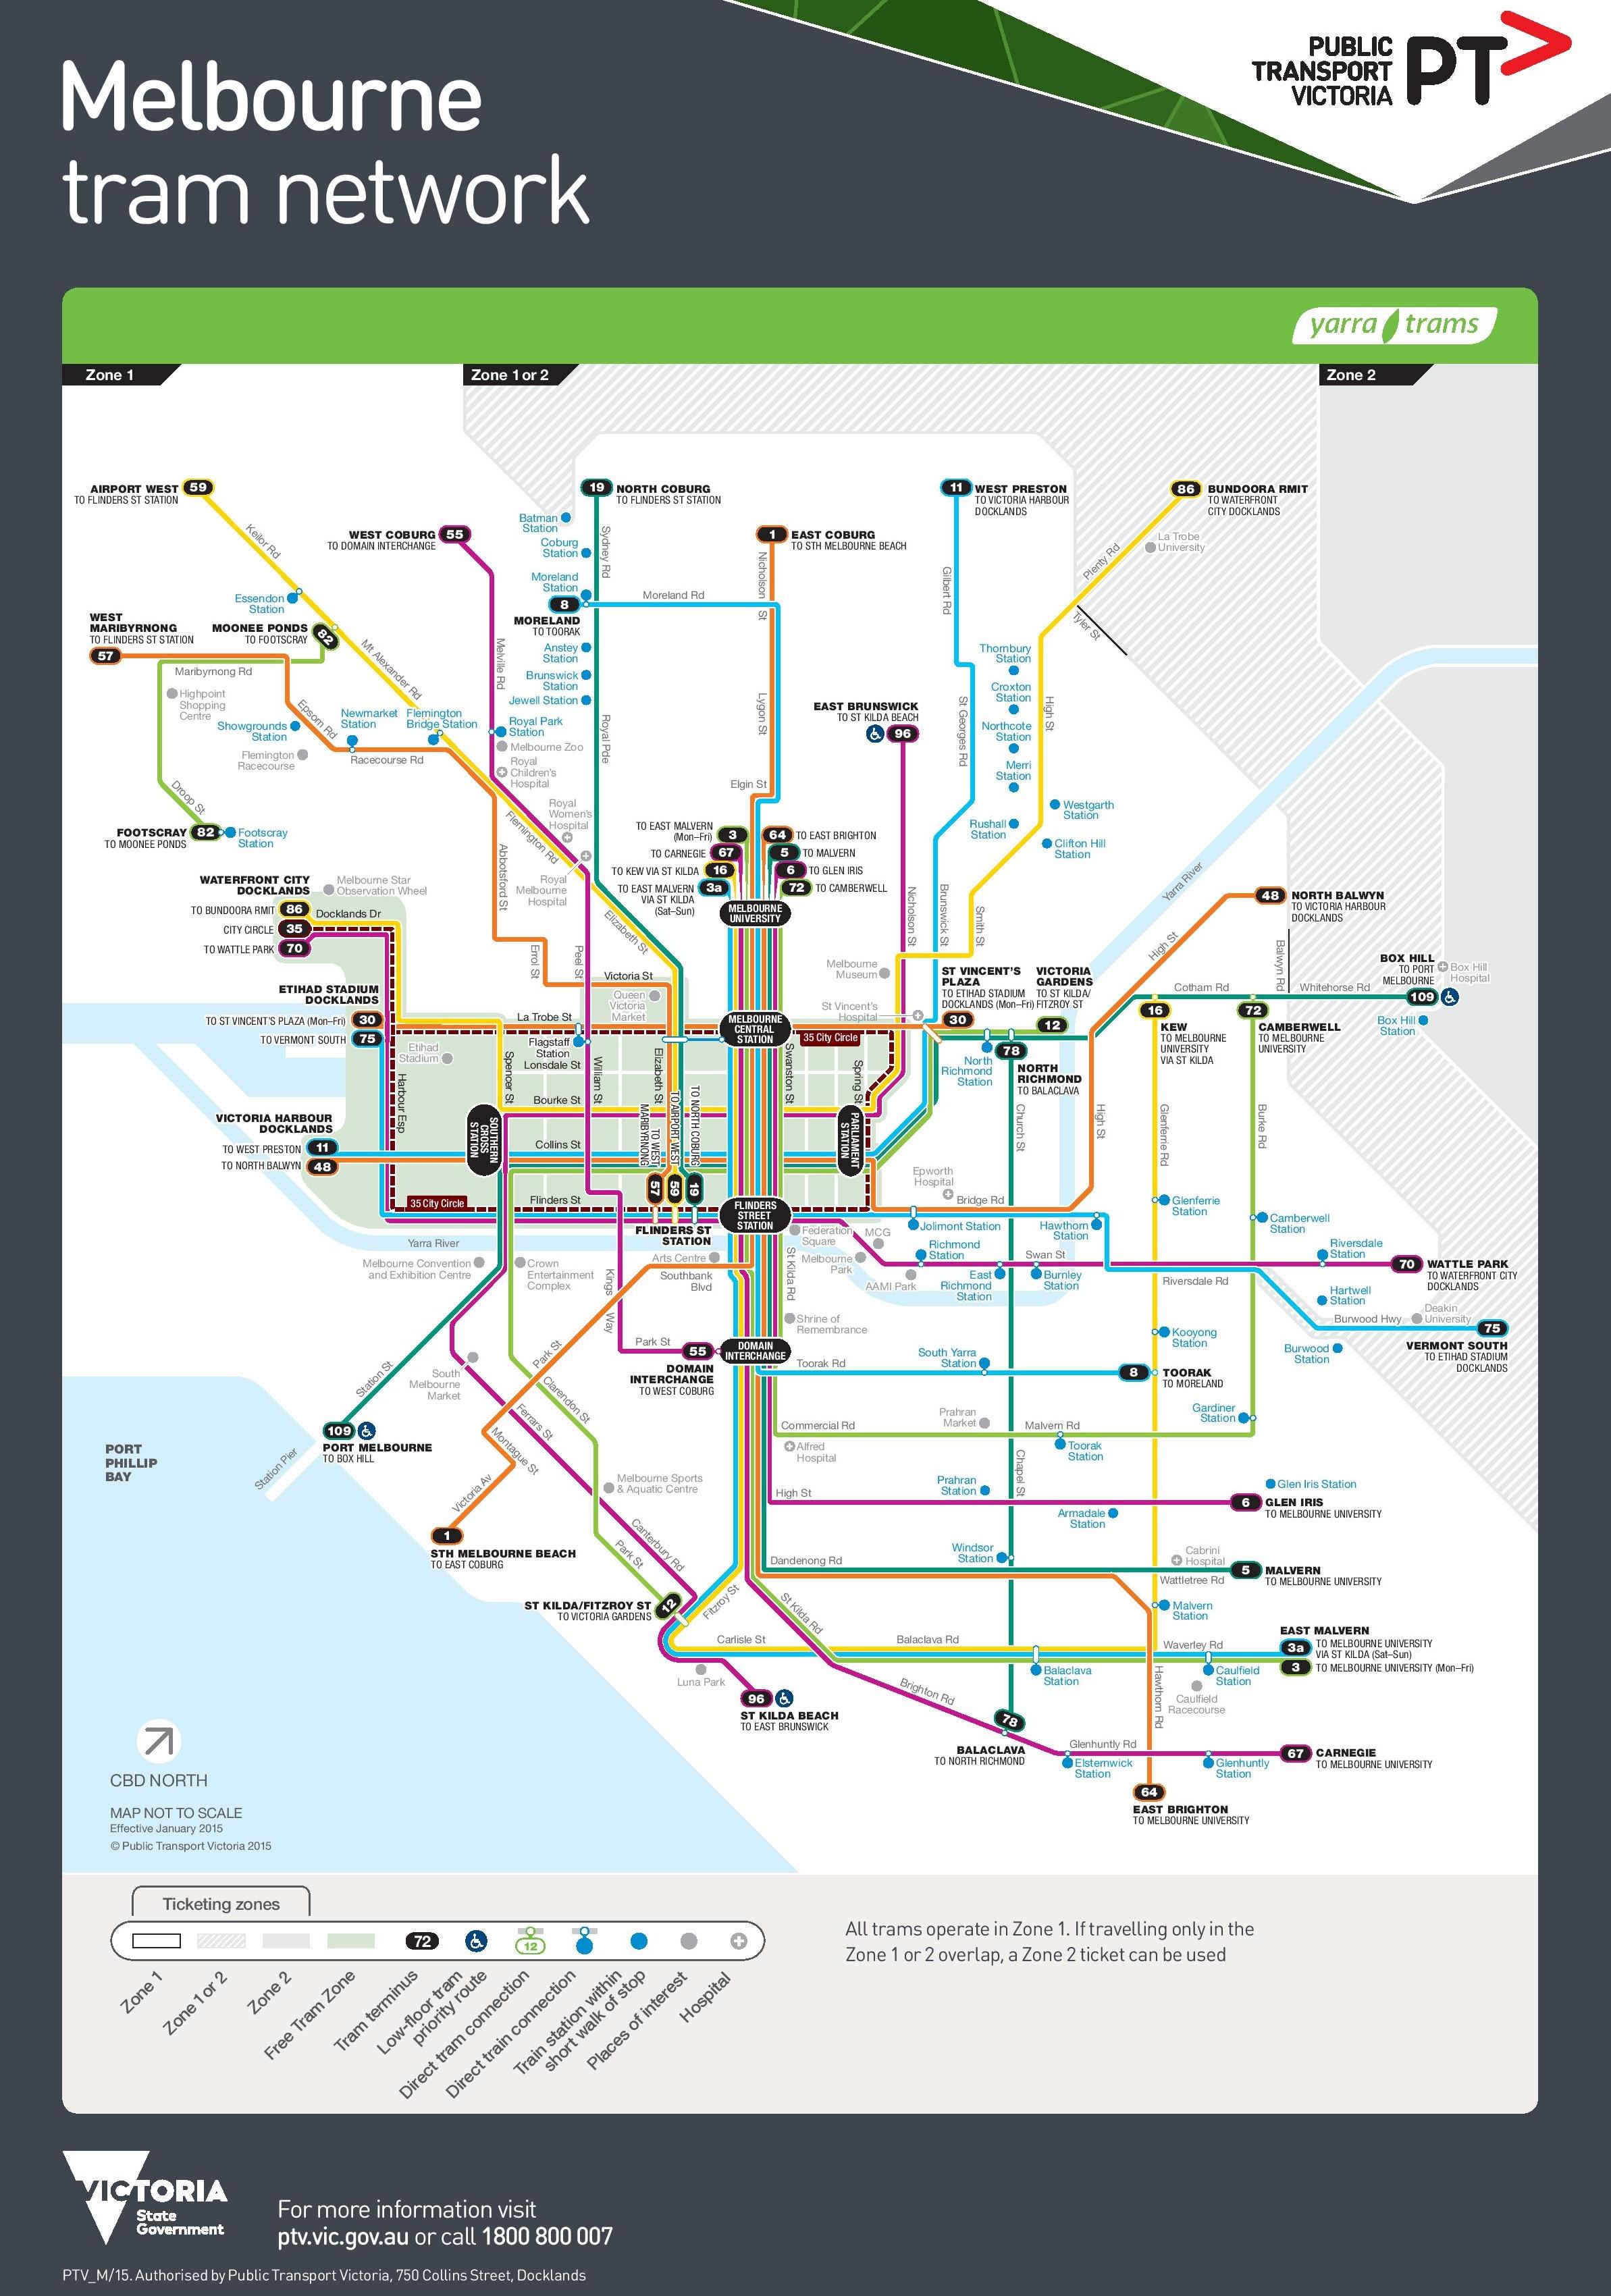 Tram Melbourne Map Melbourne tram map